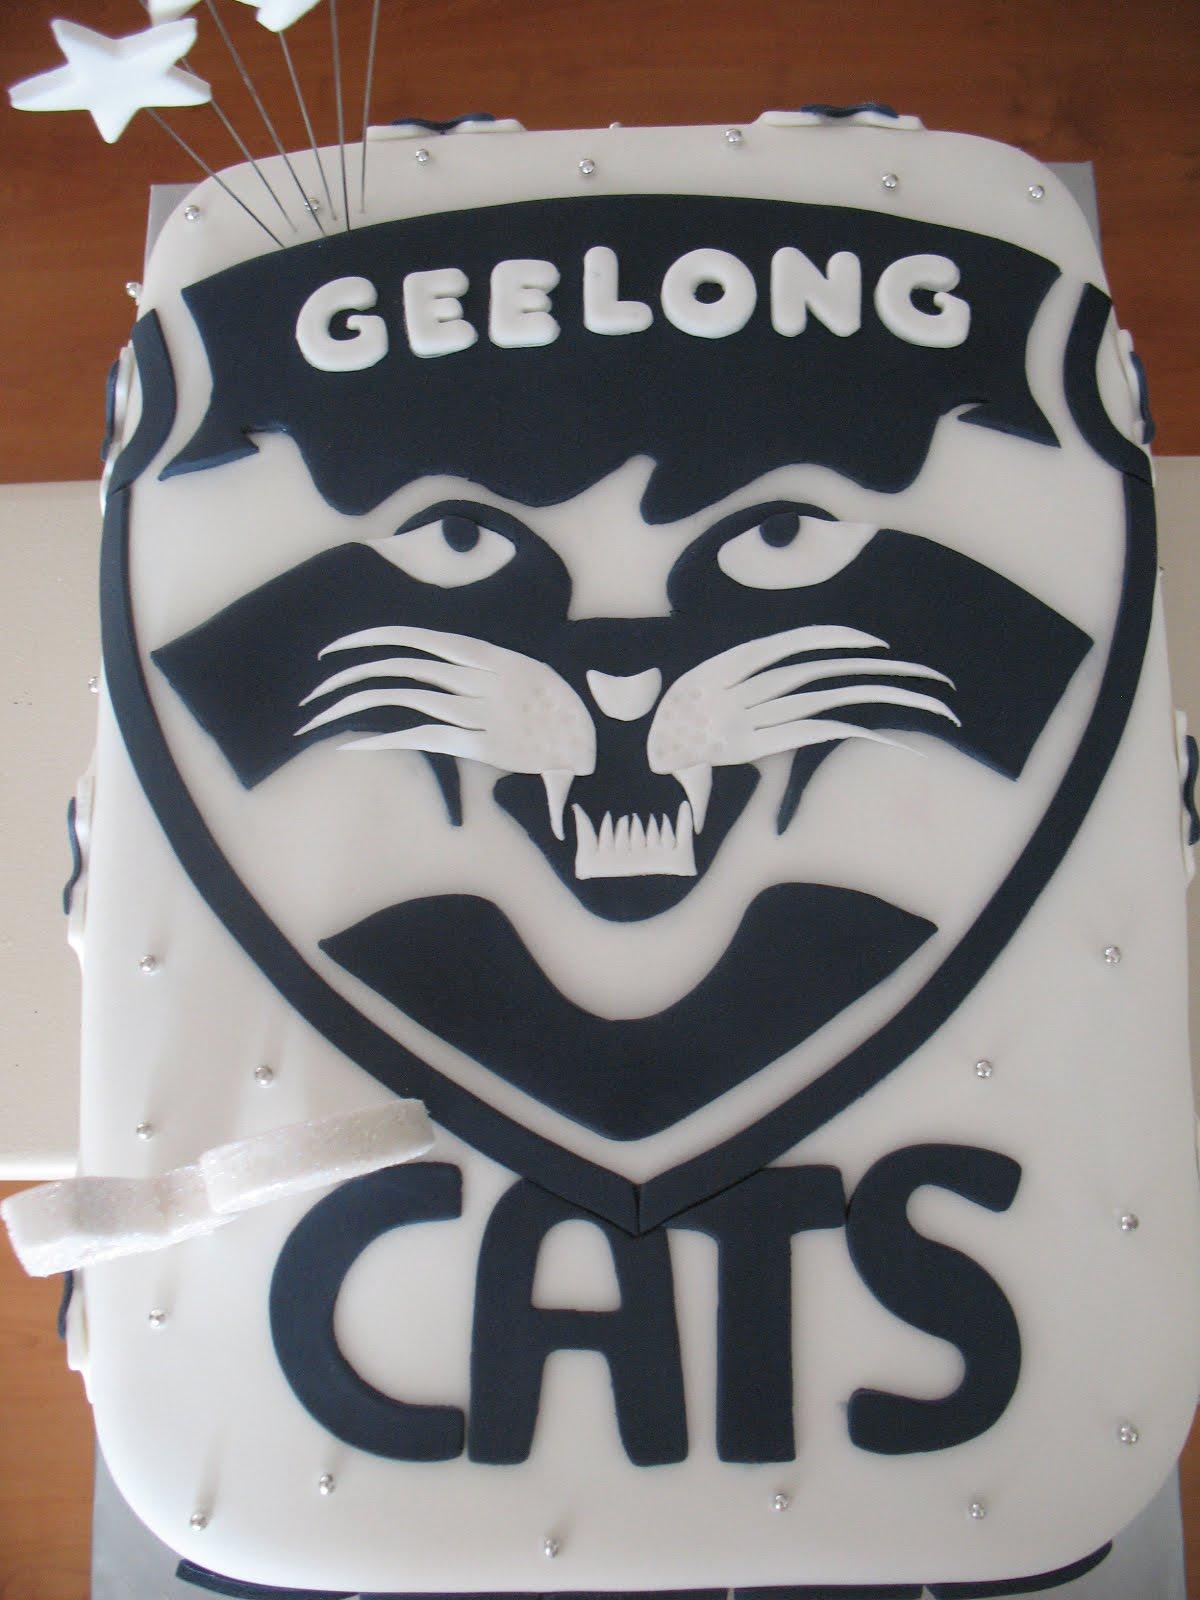 Sandys Cakes Geelong Cats